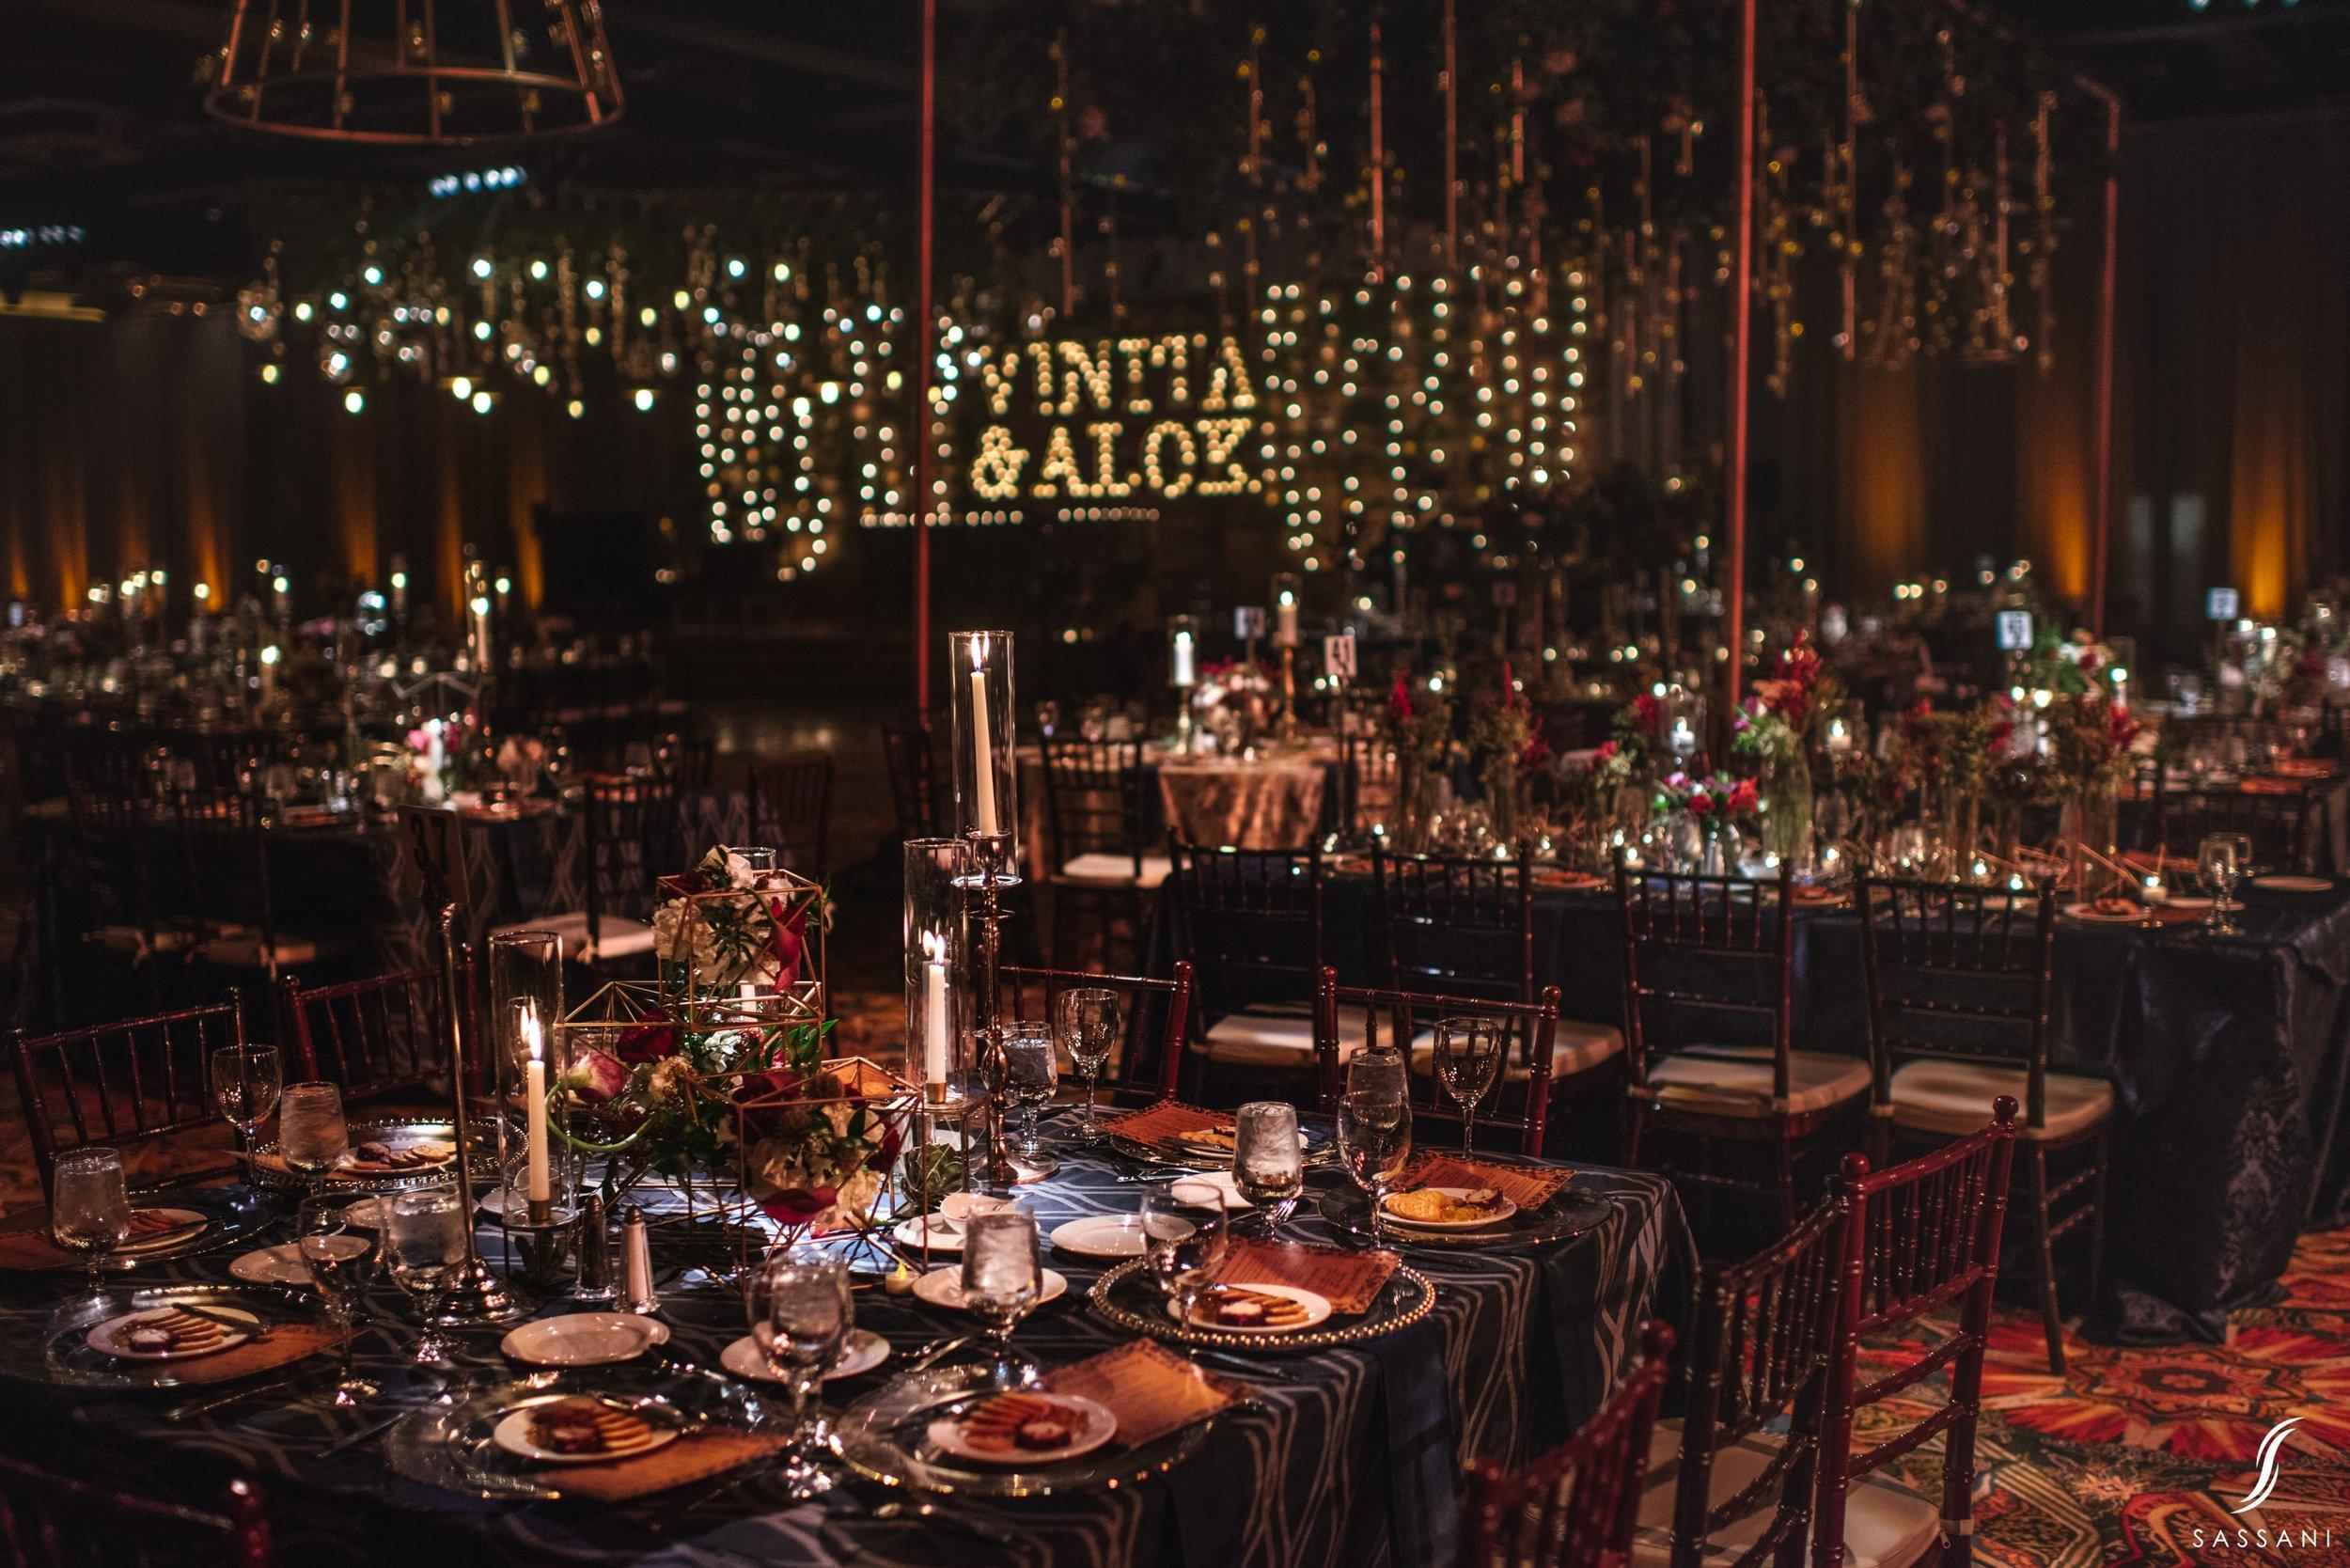 houston-weddings-vinita-alok-06.jpg